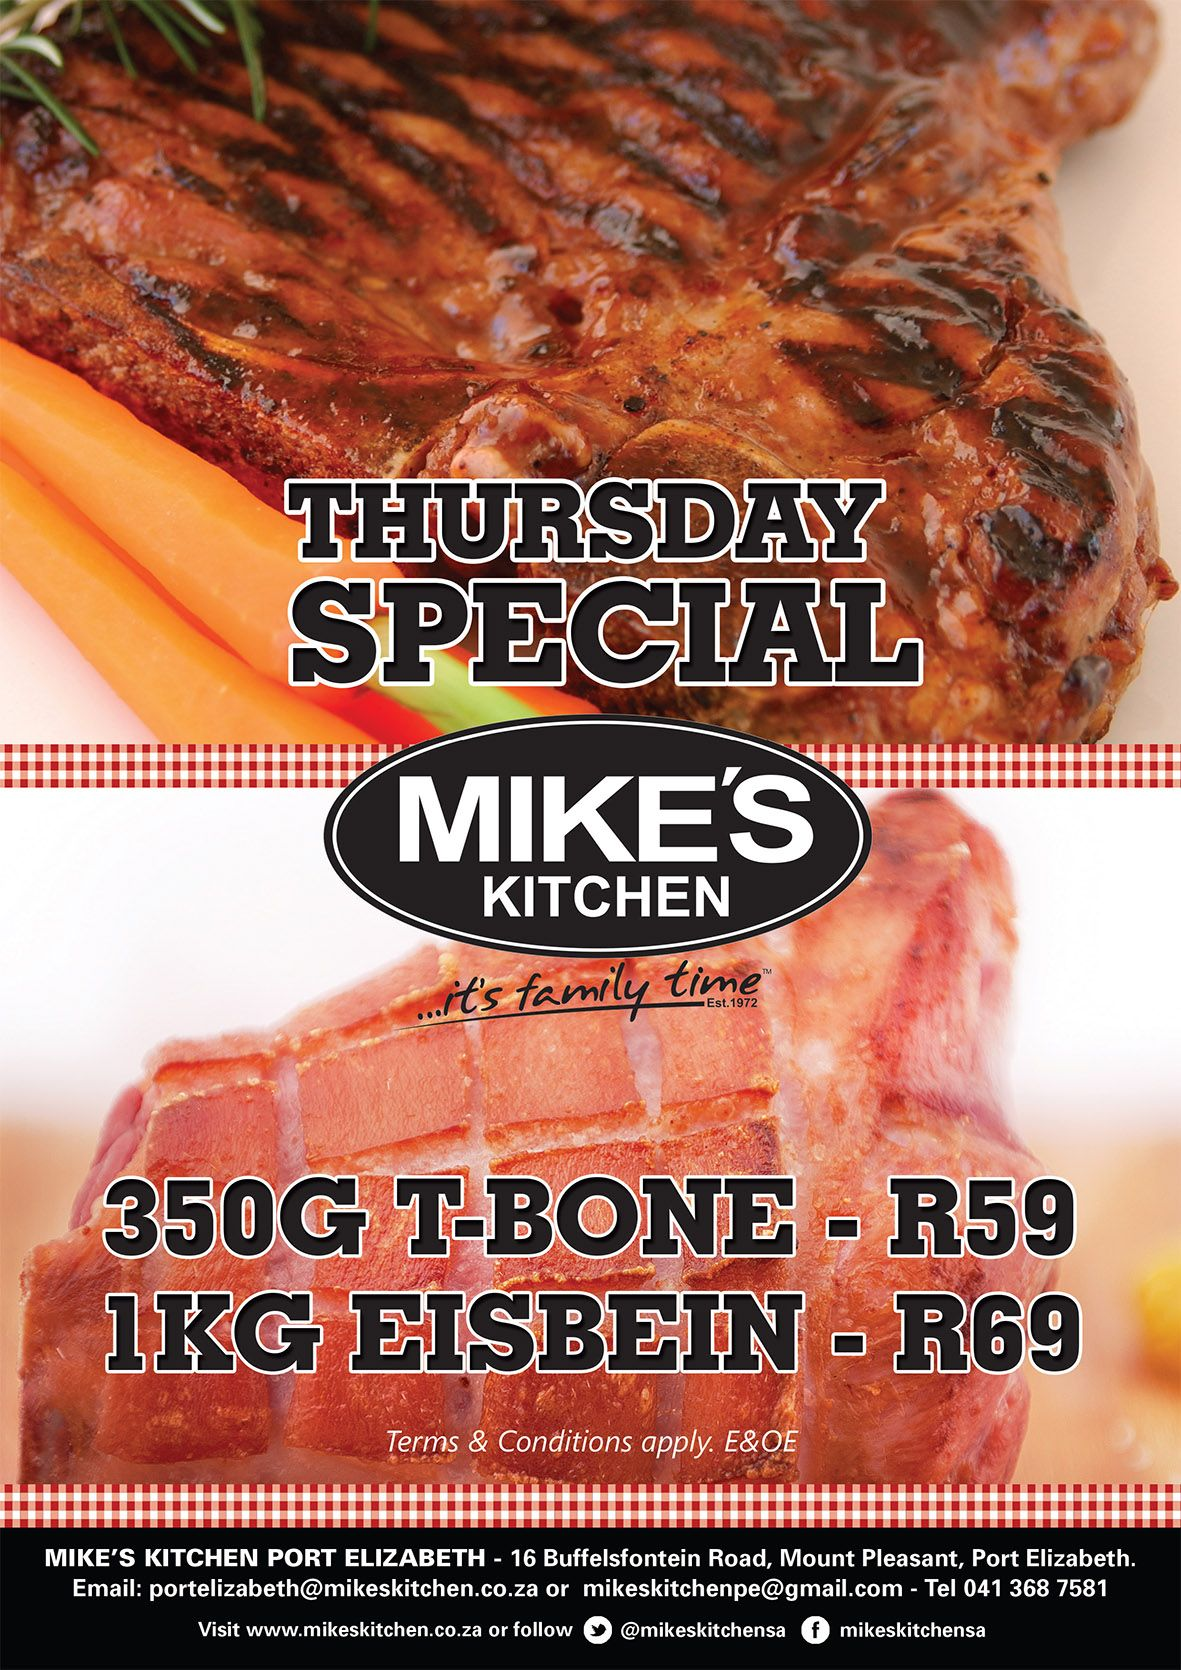 Mikes kitchen port elizabeth thursdays special thursday